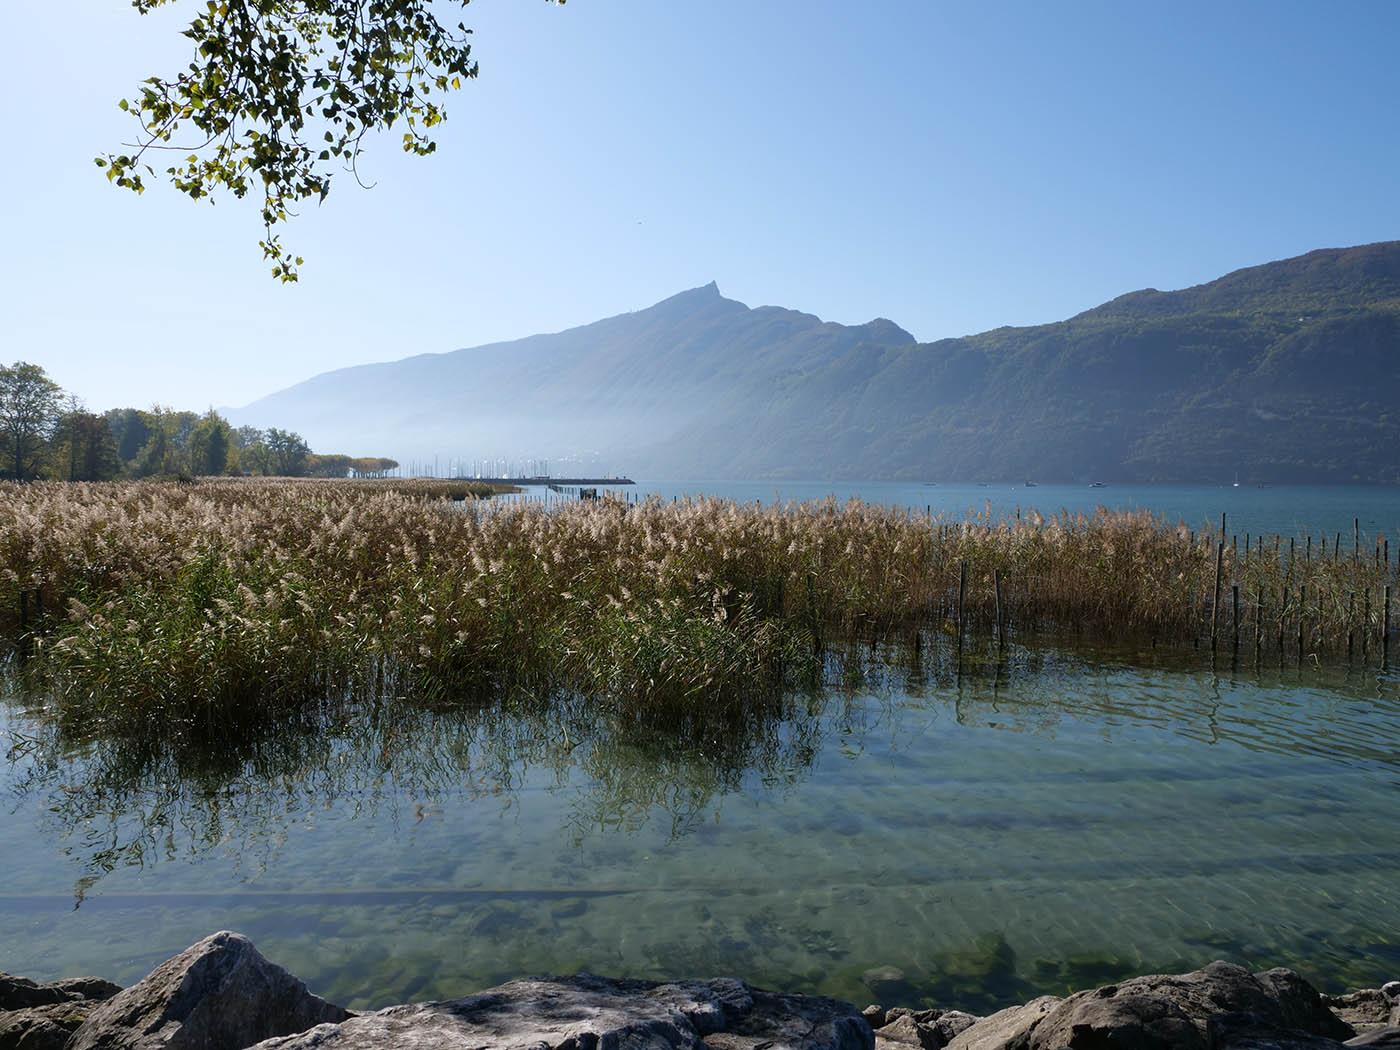 Lac en grand angle avec Olympus 12-200 mm f3.5-6.3